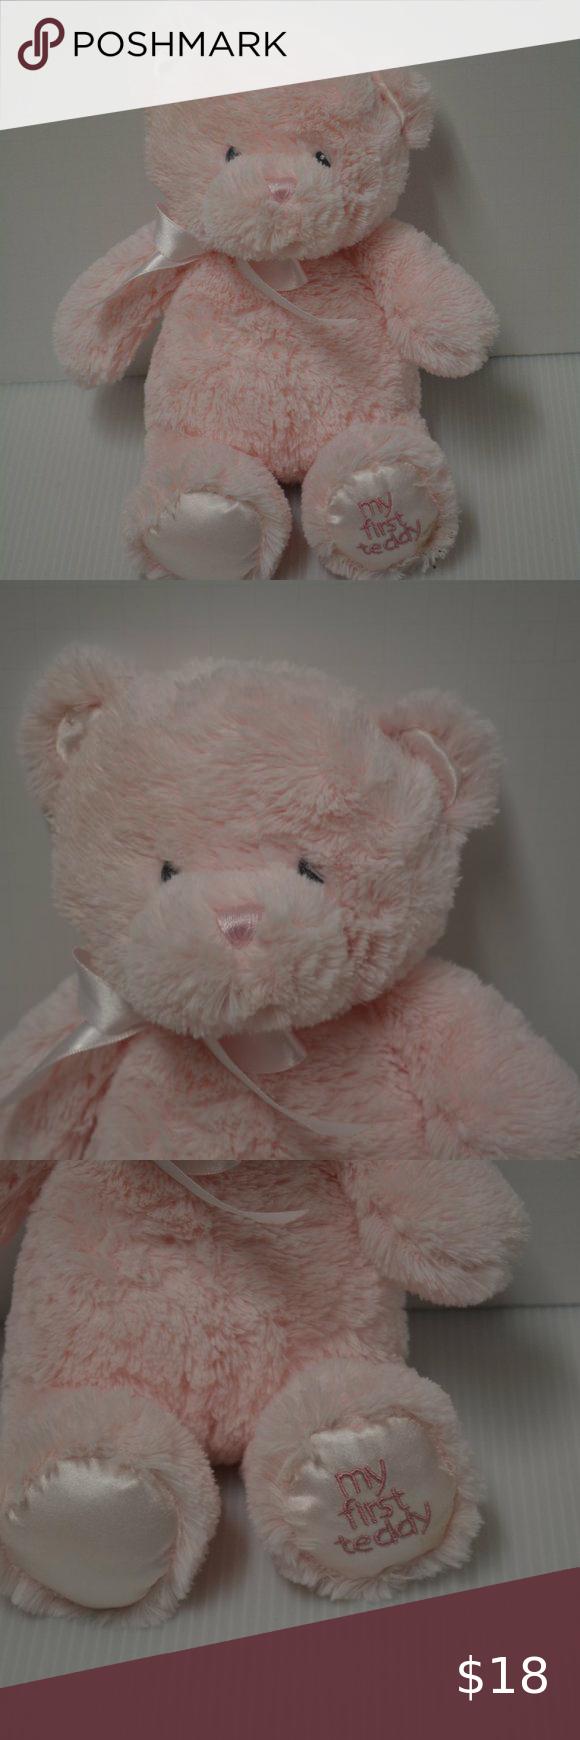 Predownload: Baby Gund My First Teddy Bear Plush Pink Girl Love Bear Plush Teddy Bear Plush Teddy Bear Stuffed Animal [ 1740 x 580 Pixel ]